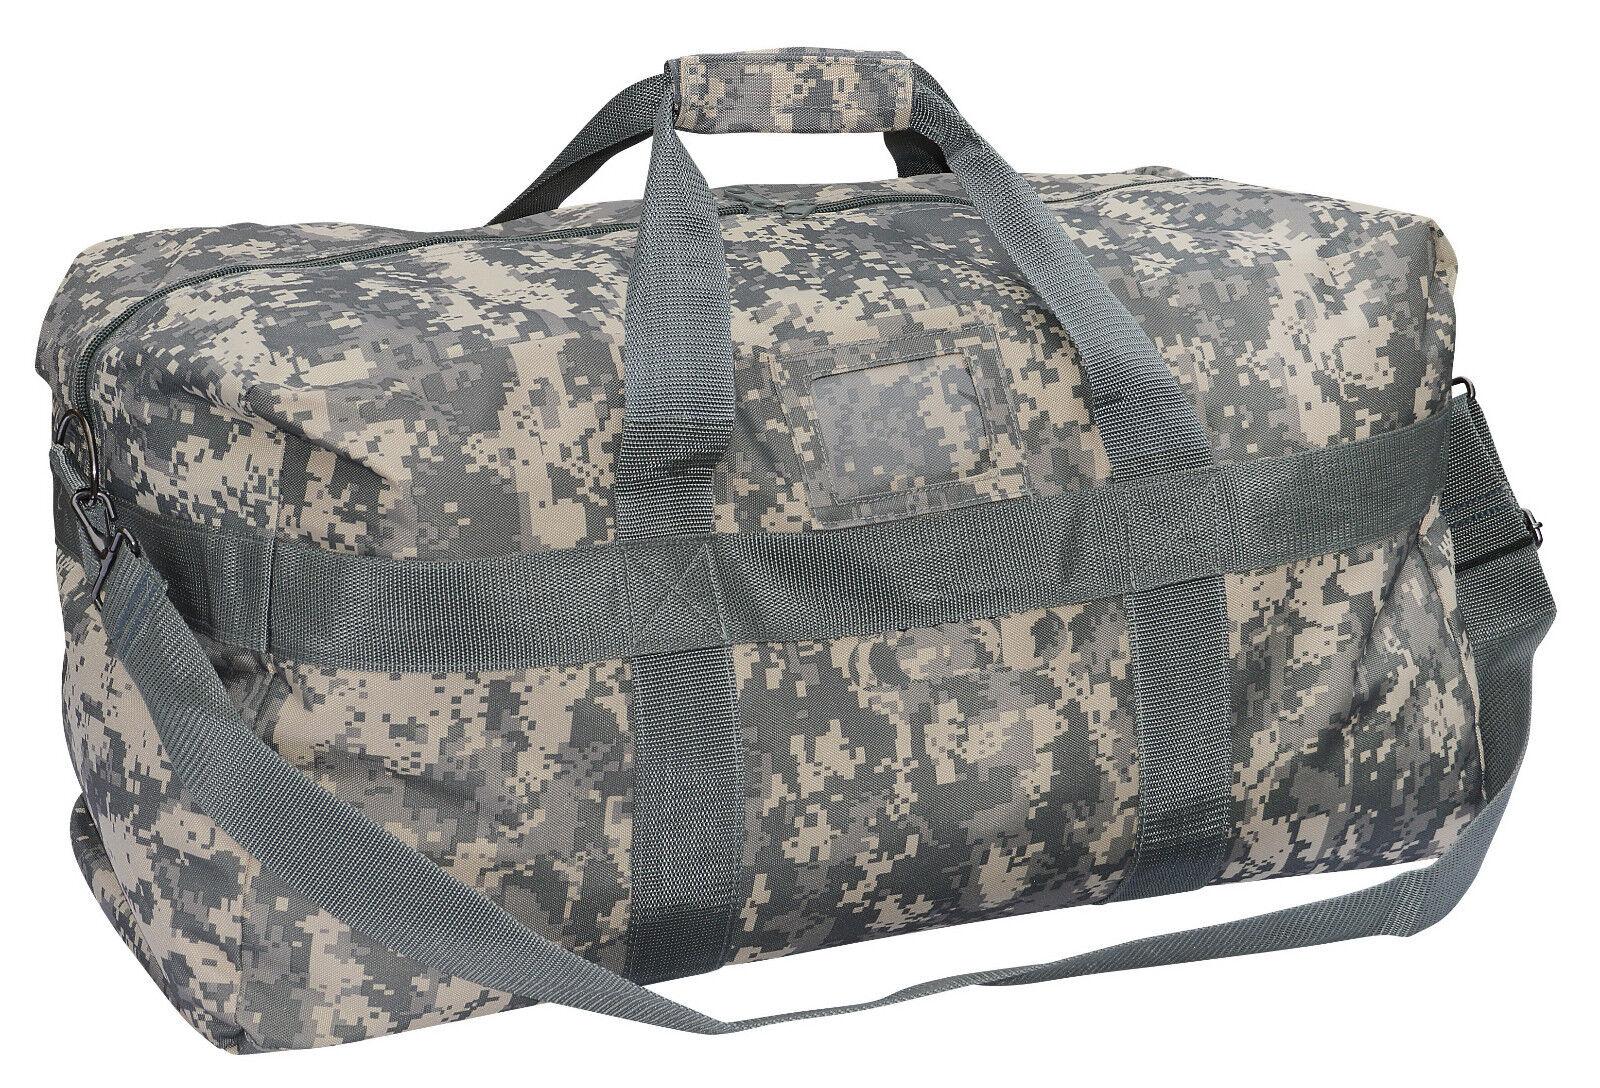 US Army Airforce Bag Borsa Borsa Borsa sportiva borsa da viaggio resistente all'acqua 57l ACU DIGITAL 7b90d4